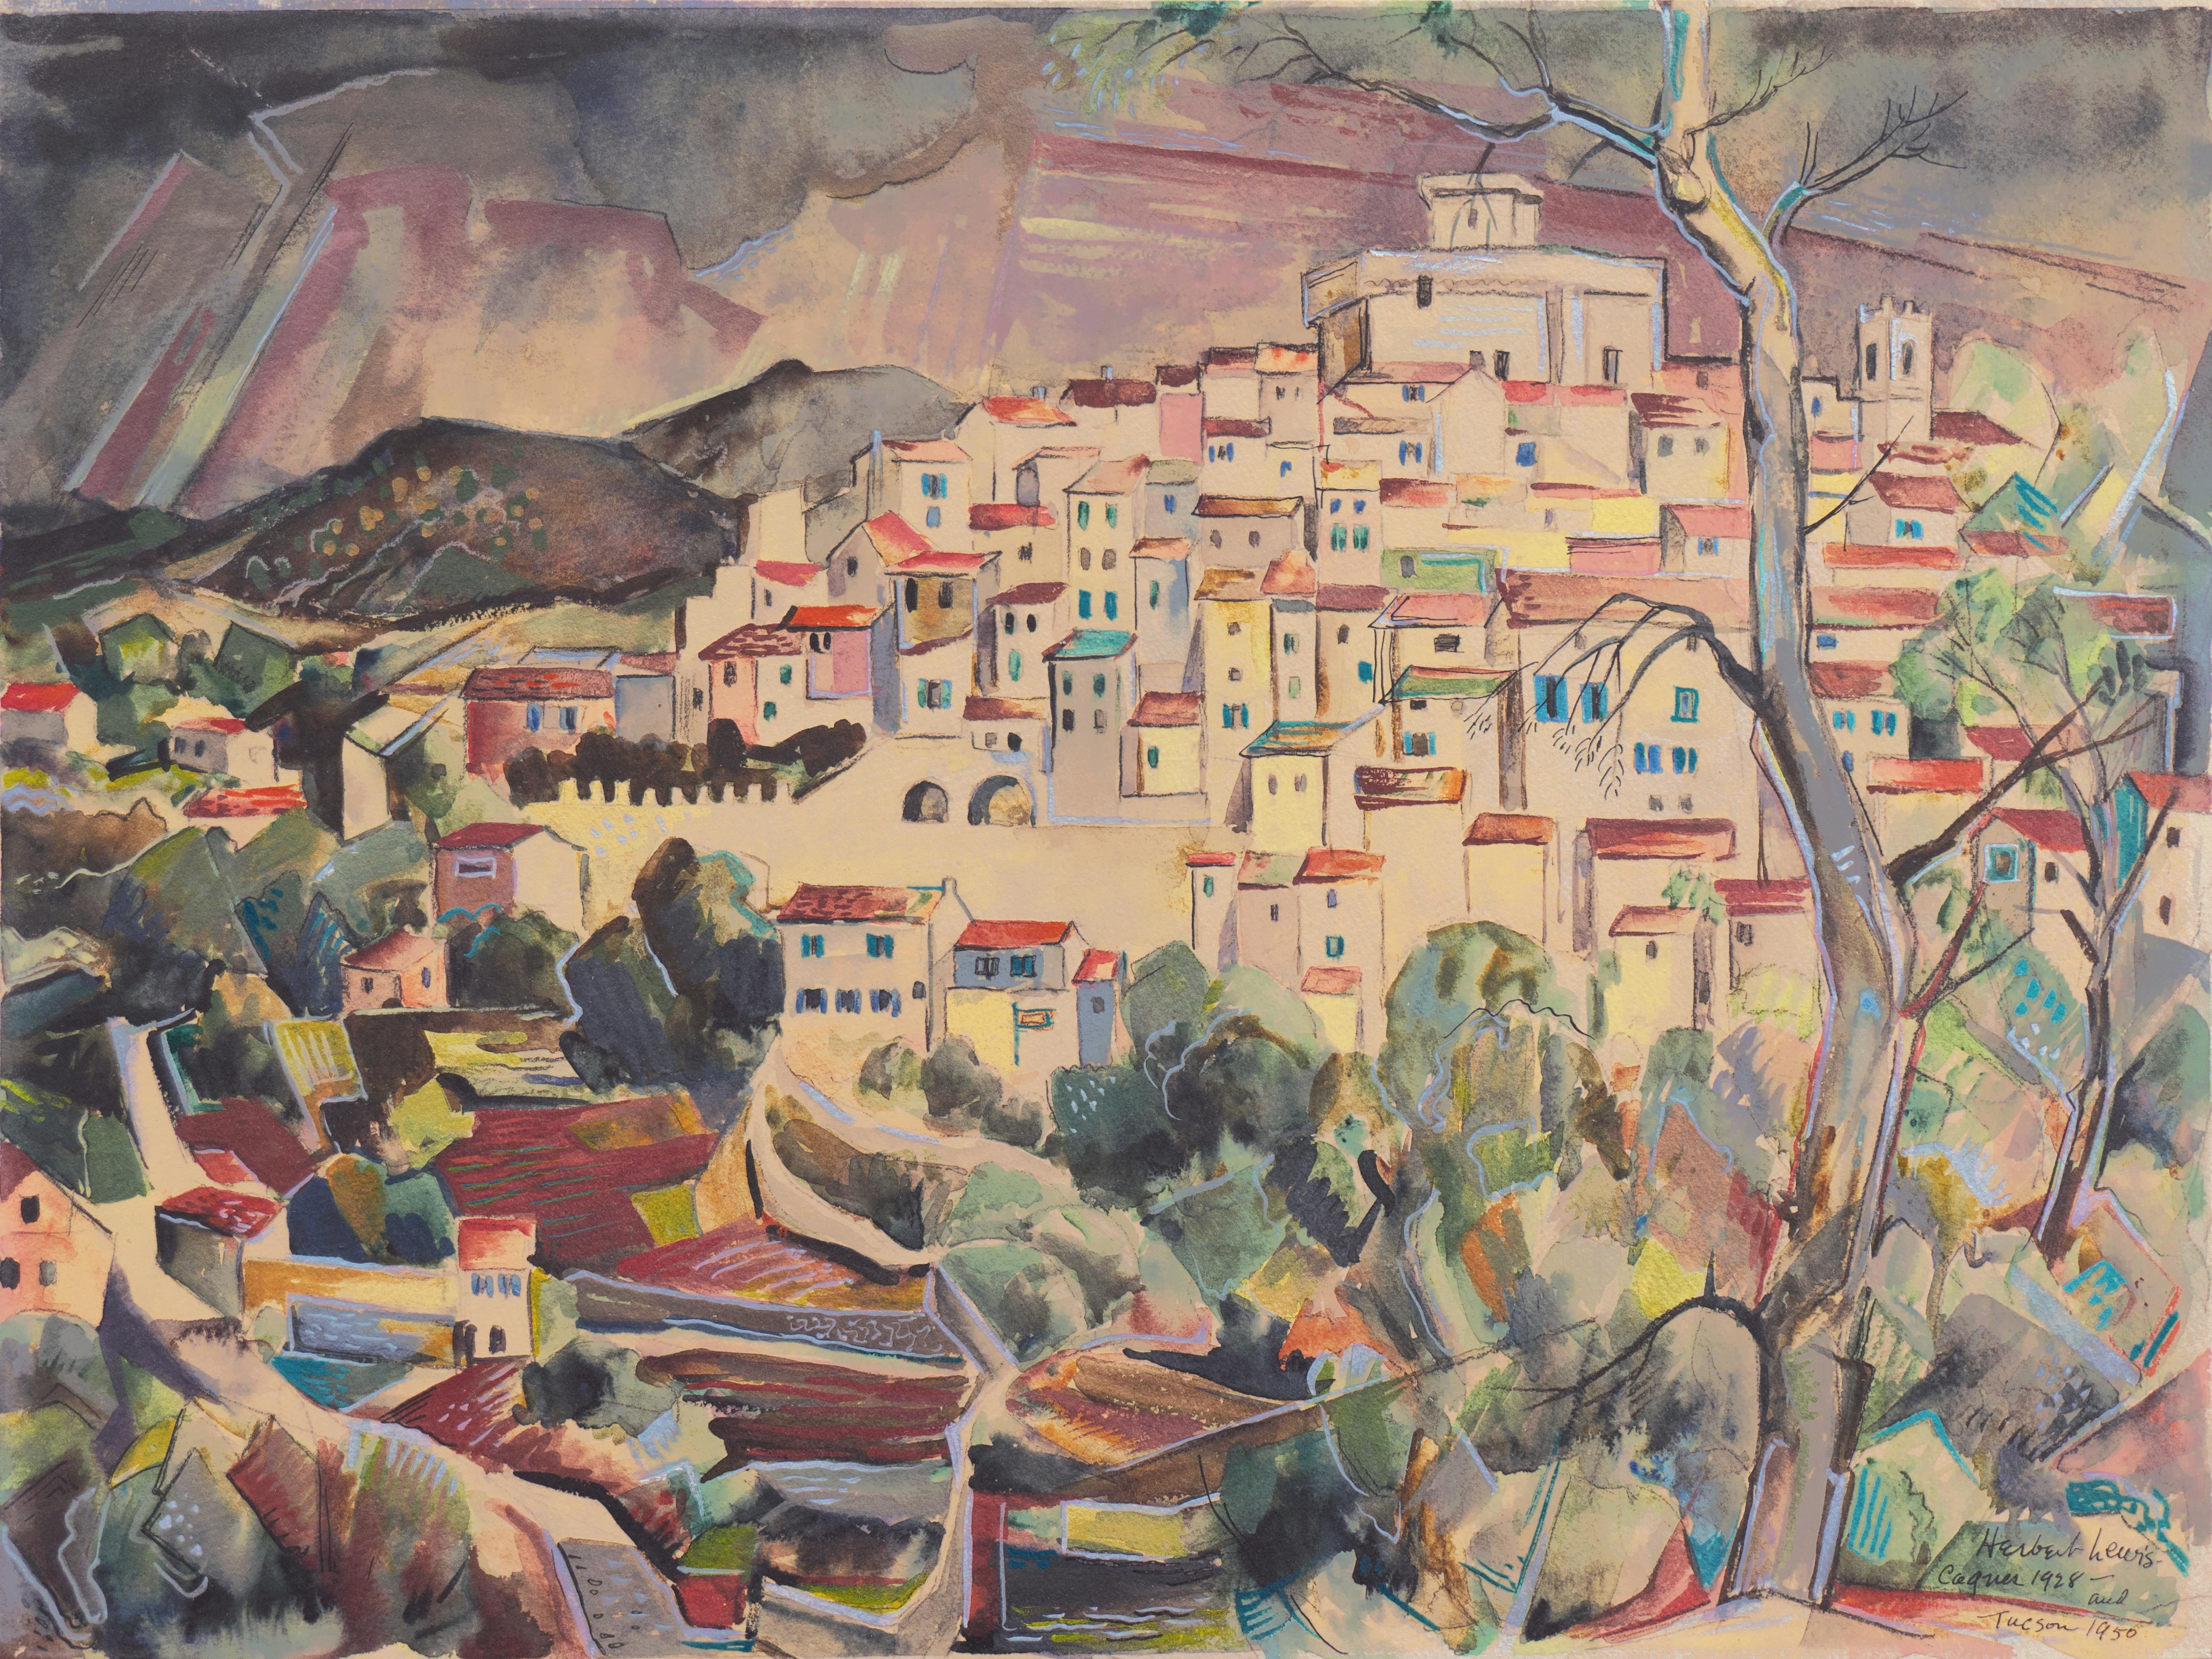 'After the Storm', Carmel, California, Paris, Academie Julian, New York, AIC